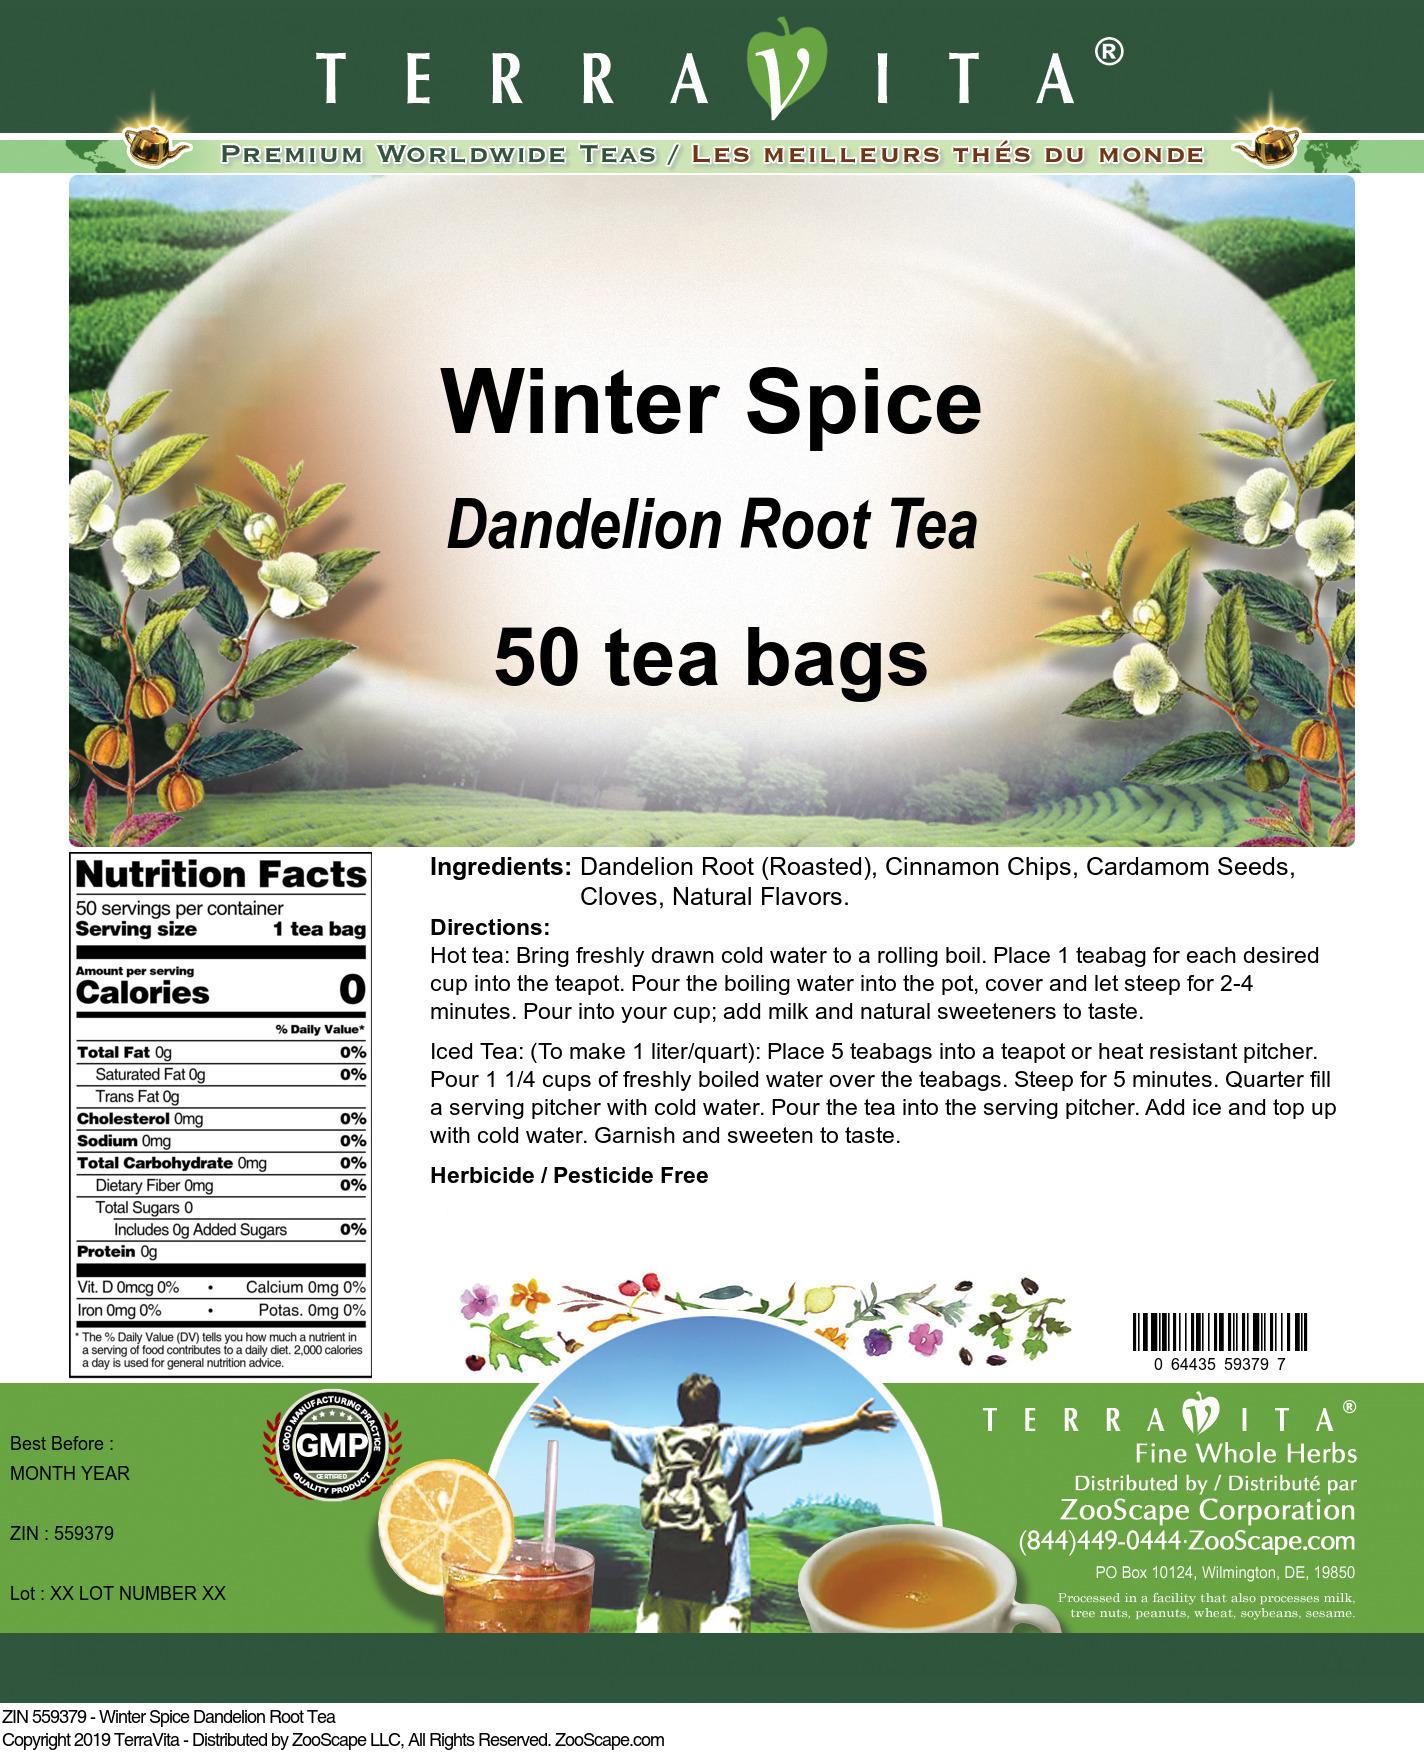 Winter Spice Dandelion Root